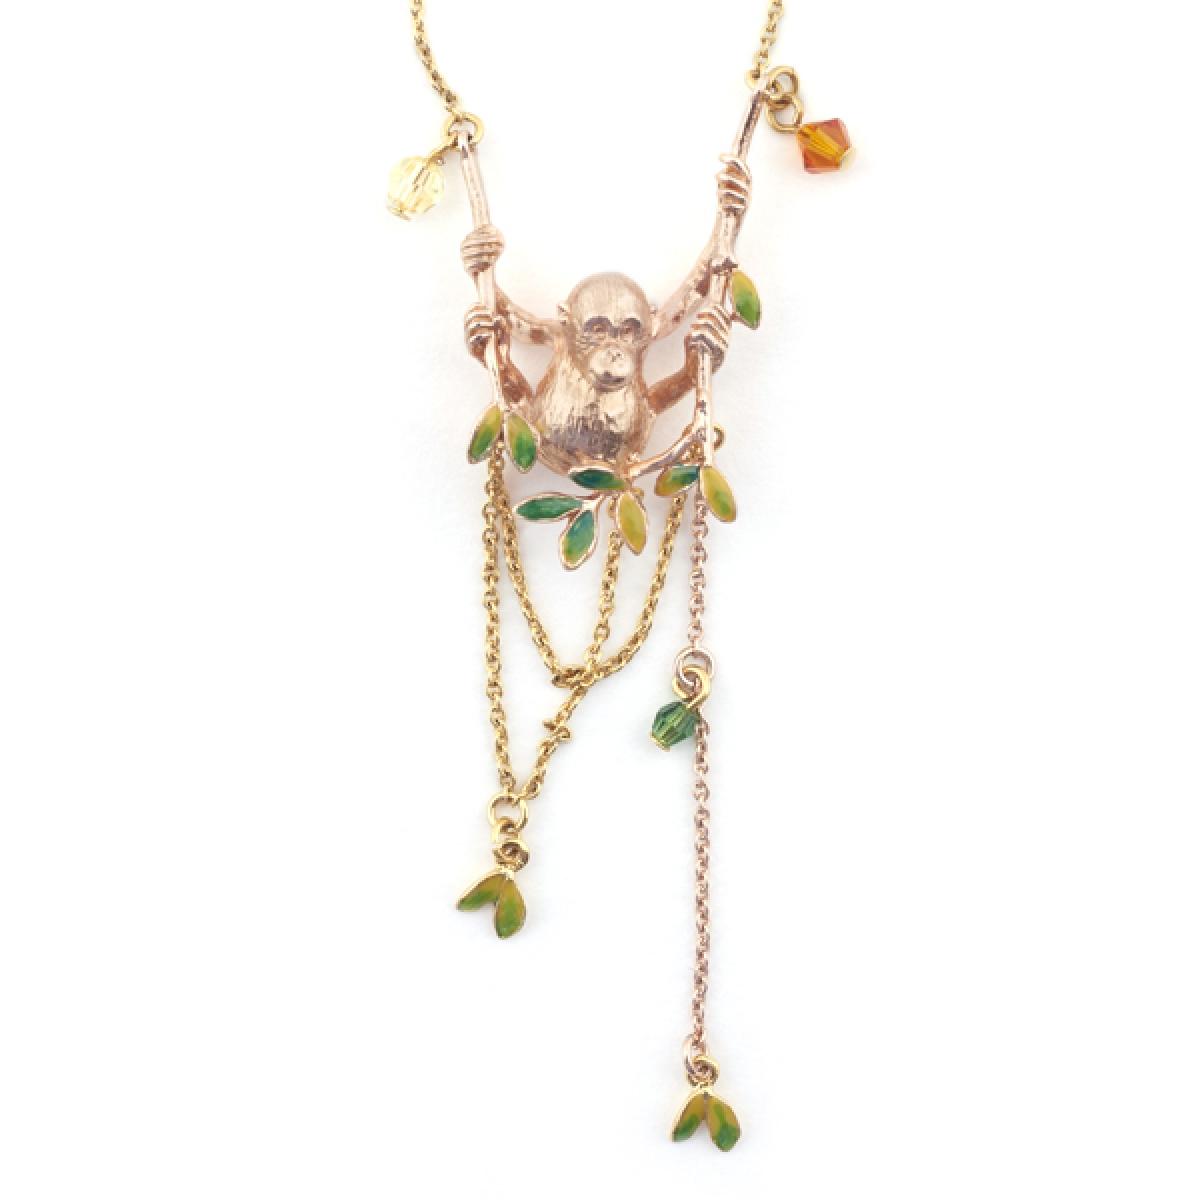 Orangutan Swing Necklace Fashion Jewellery